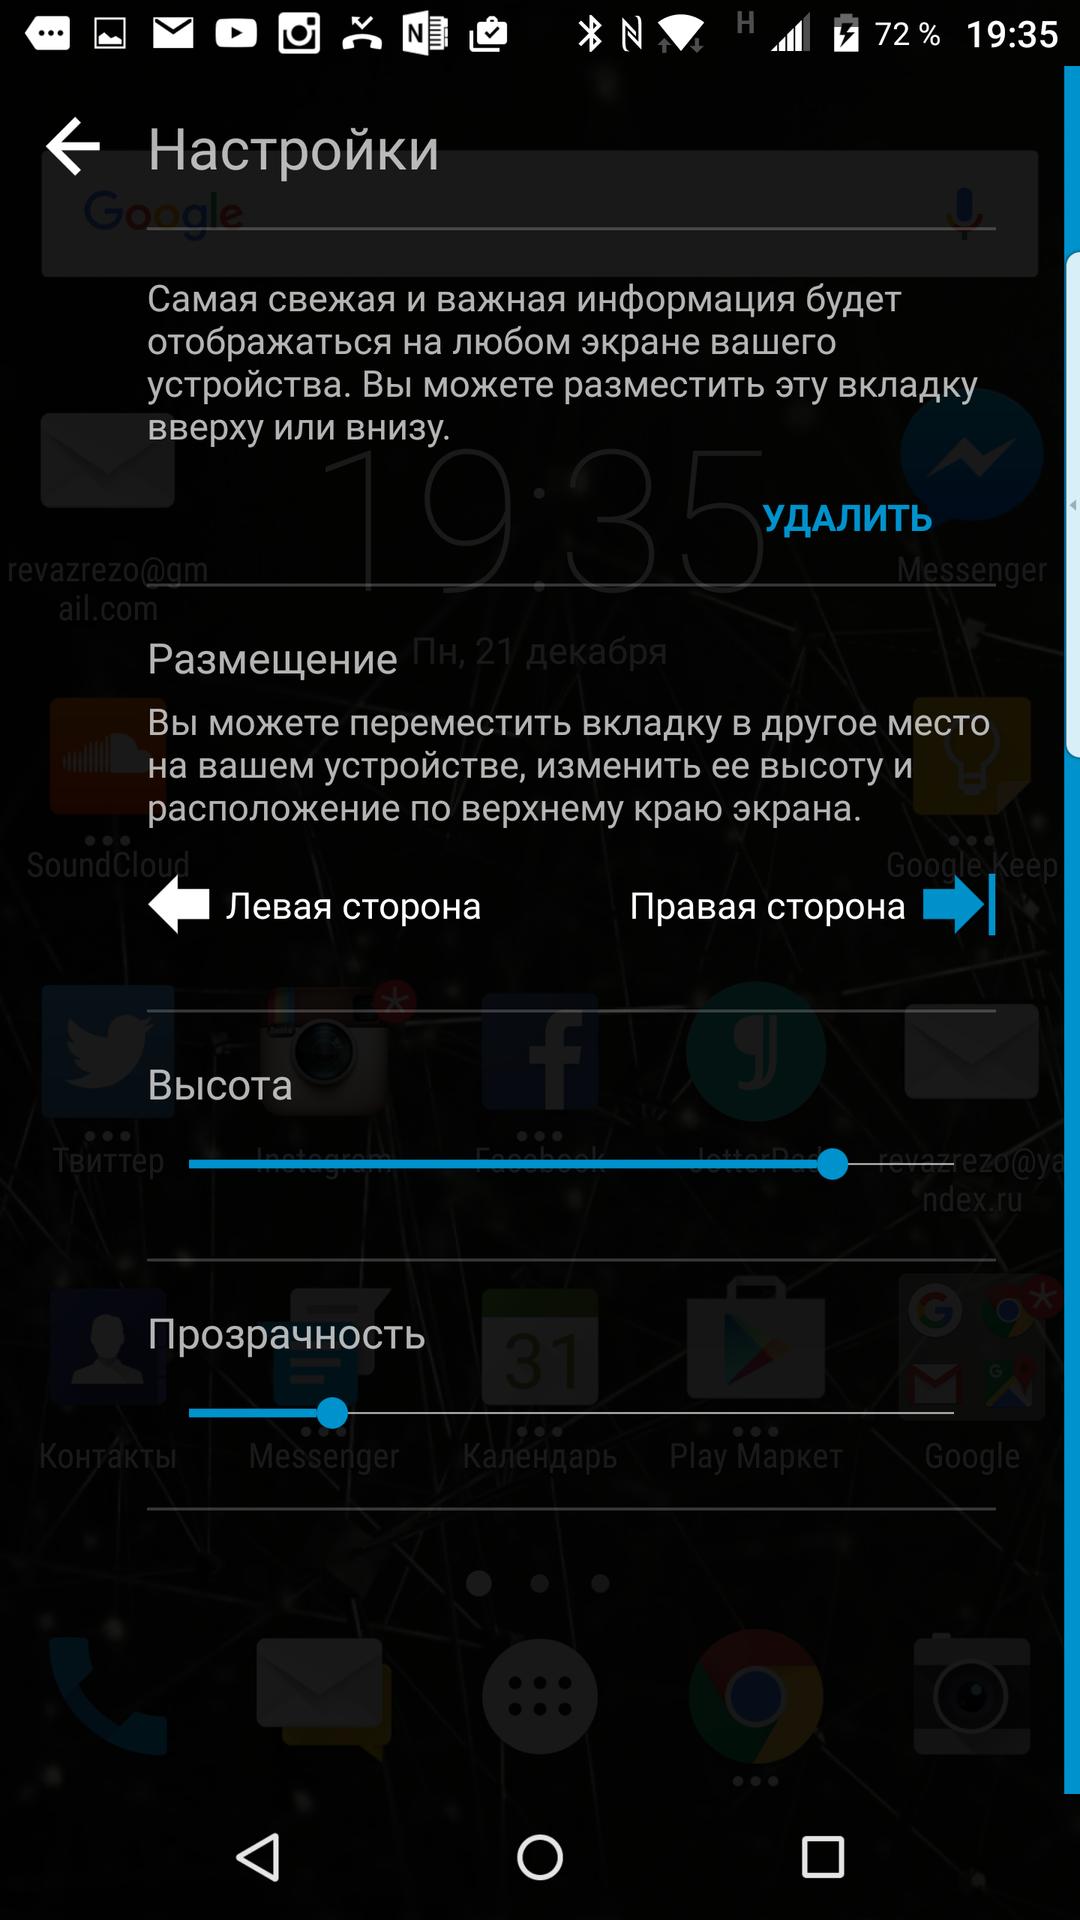 screenshot2015-12-21-19-35-28-1080x1920